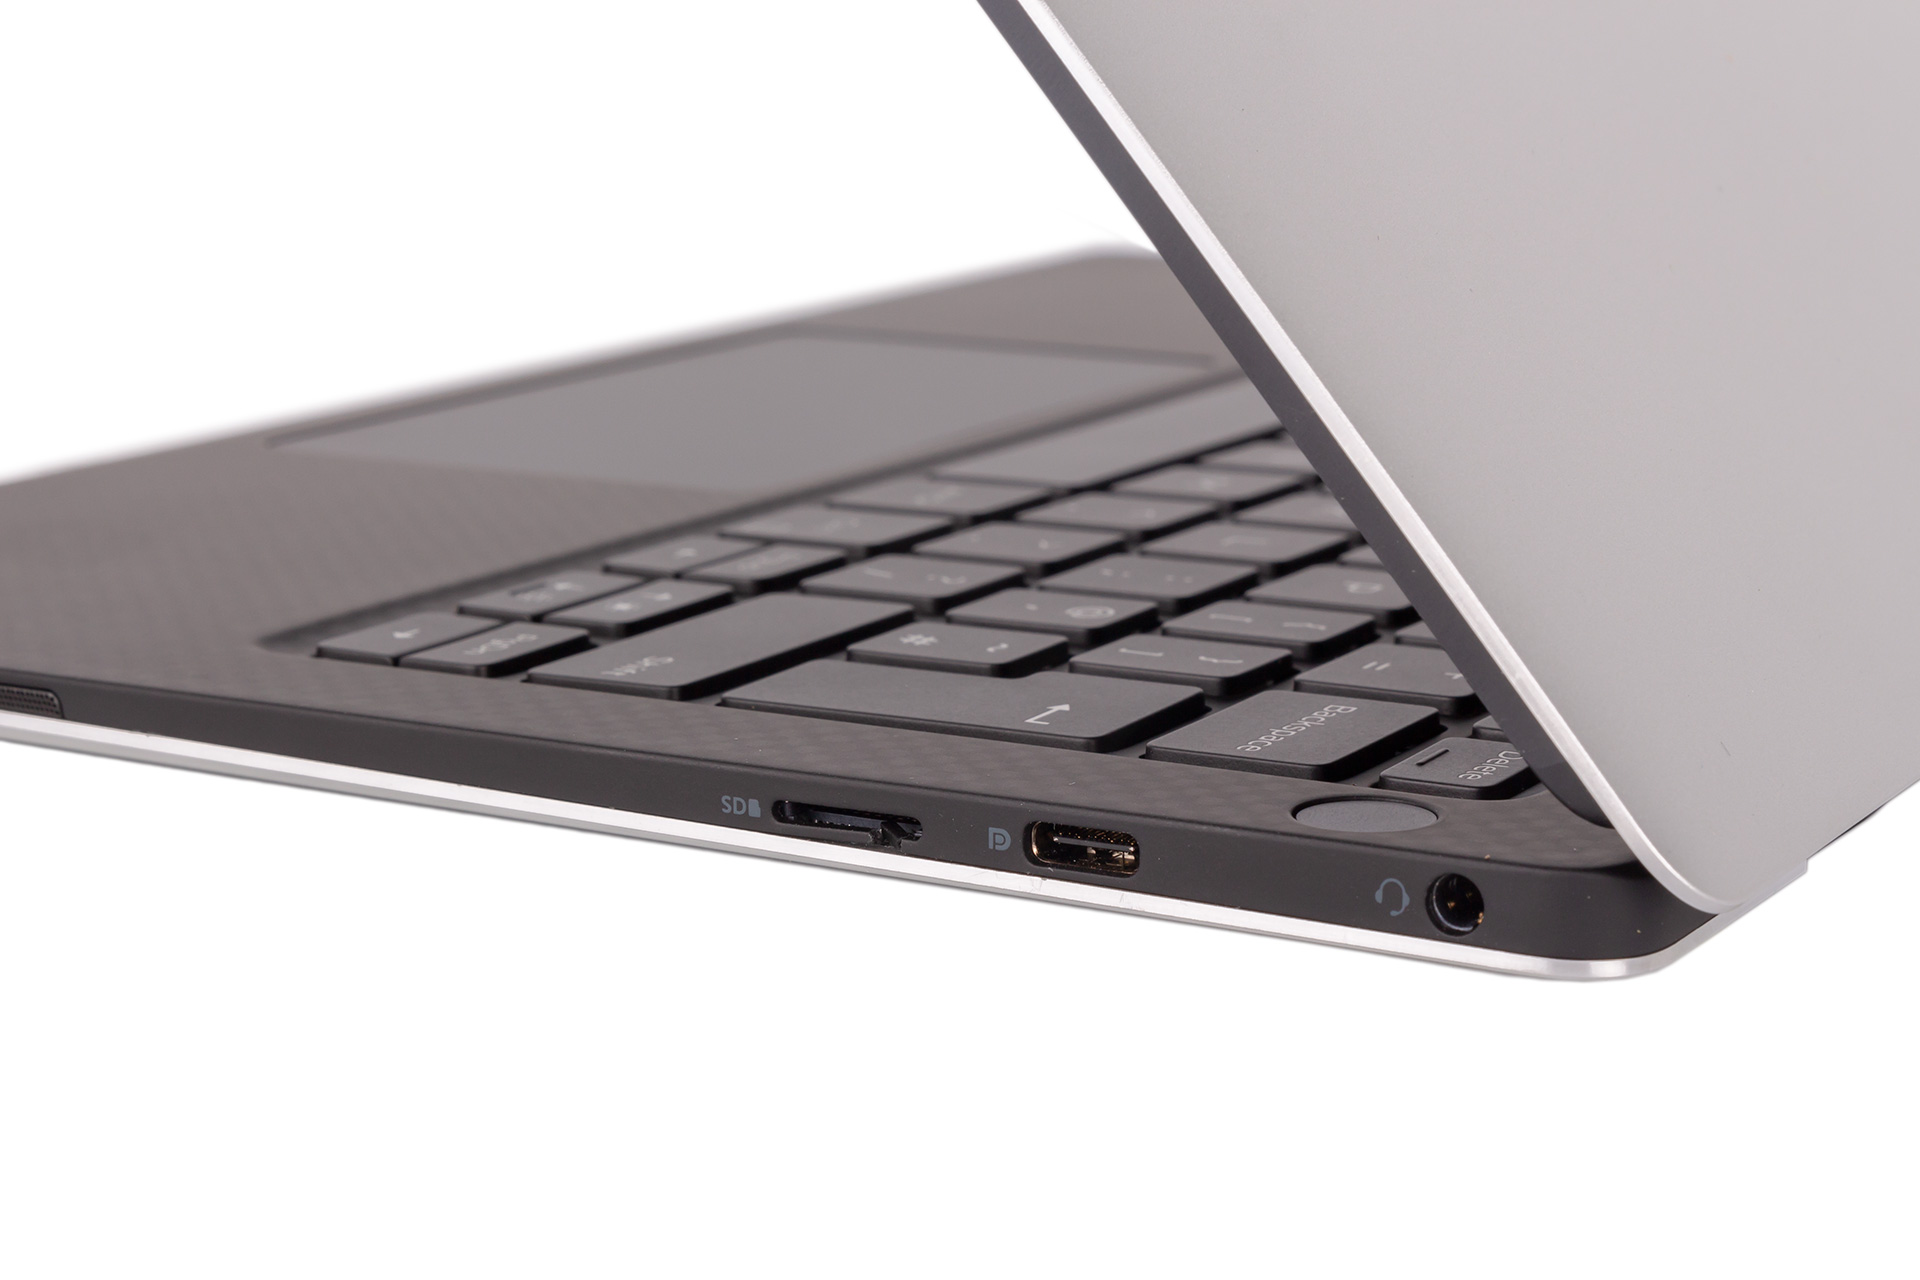 Dell XPS 13 9370 Review | bit-tech net